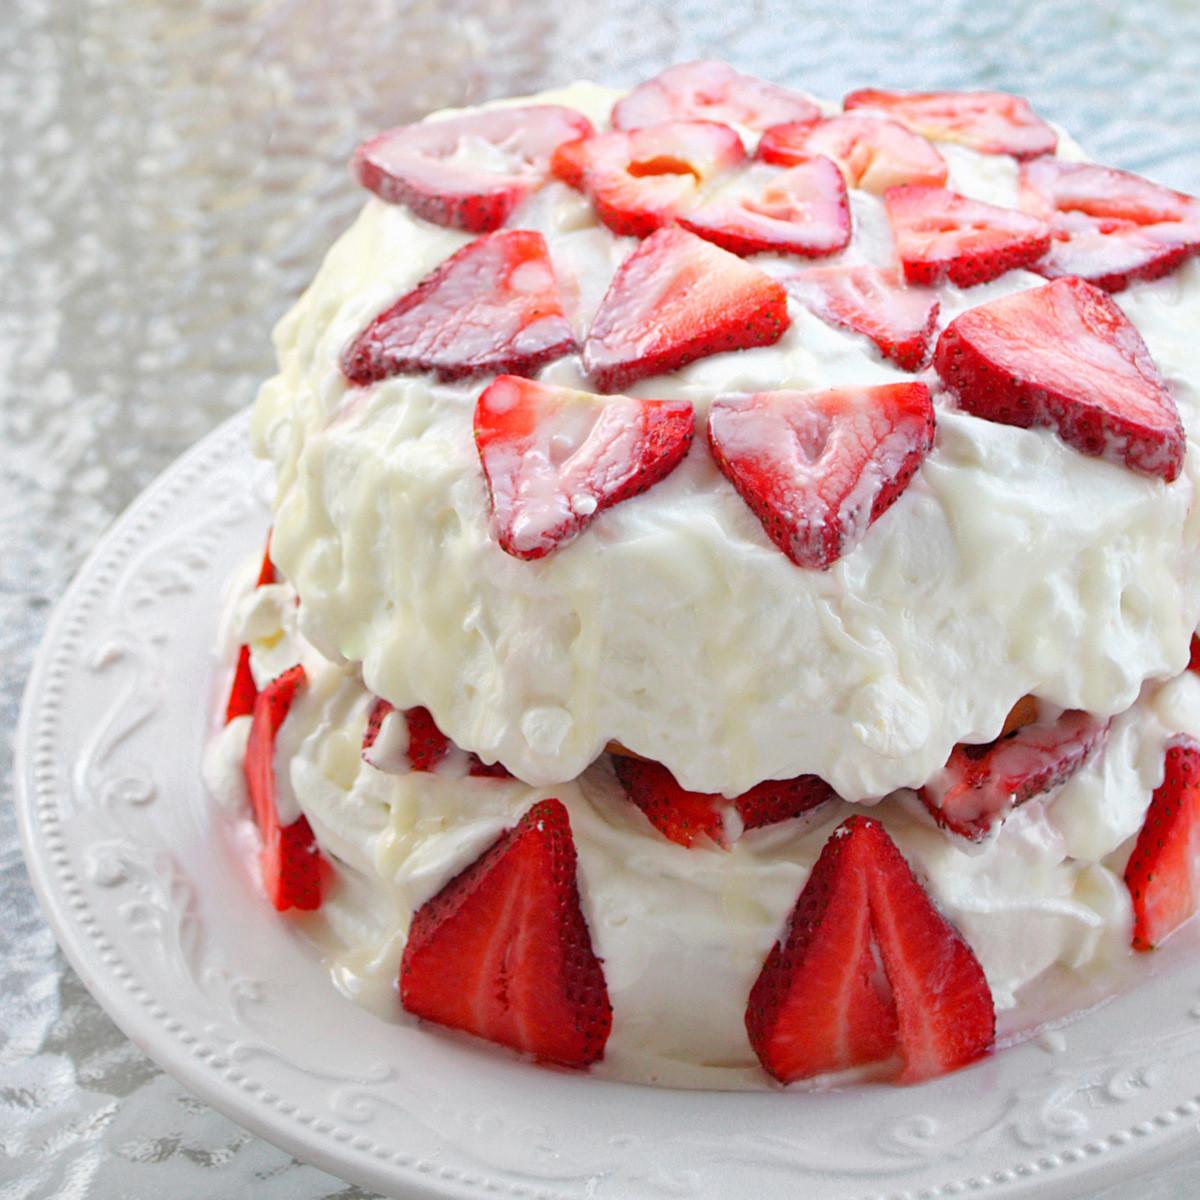 Strawberry Shortcake Videos  Strawberry Shortcake with Almond Glaze The Girl Who Ate